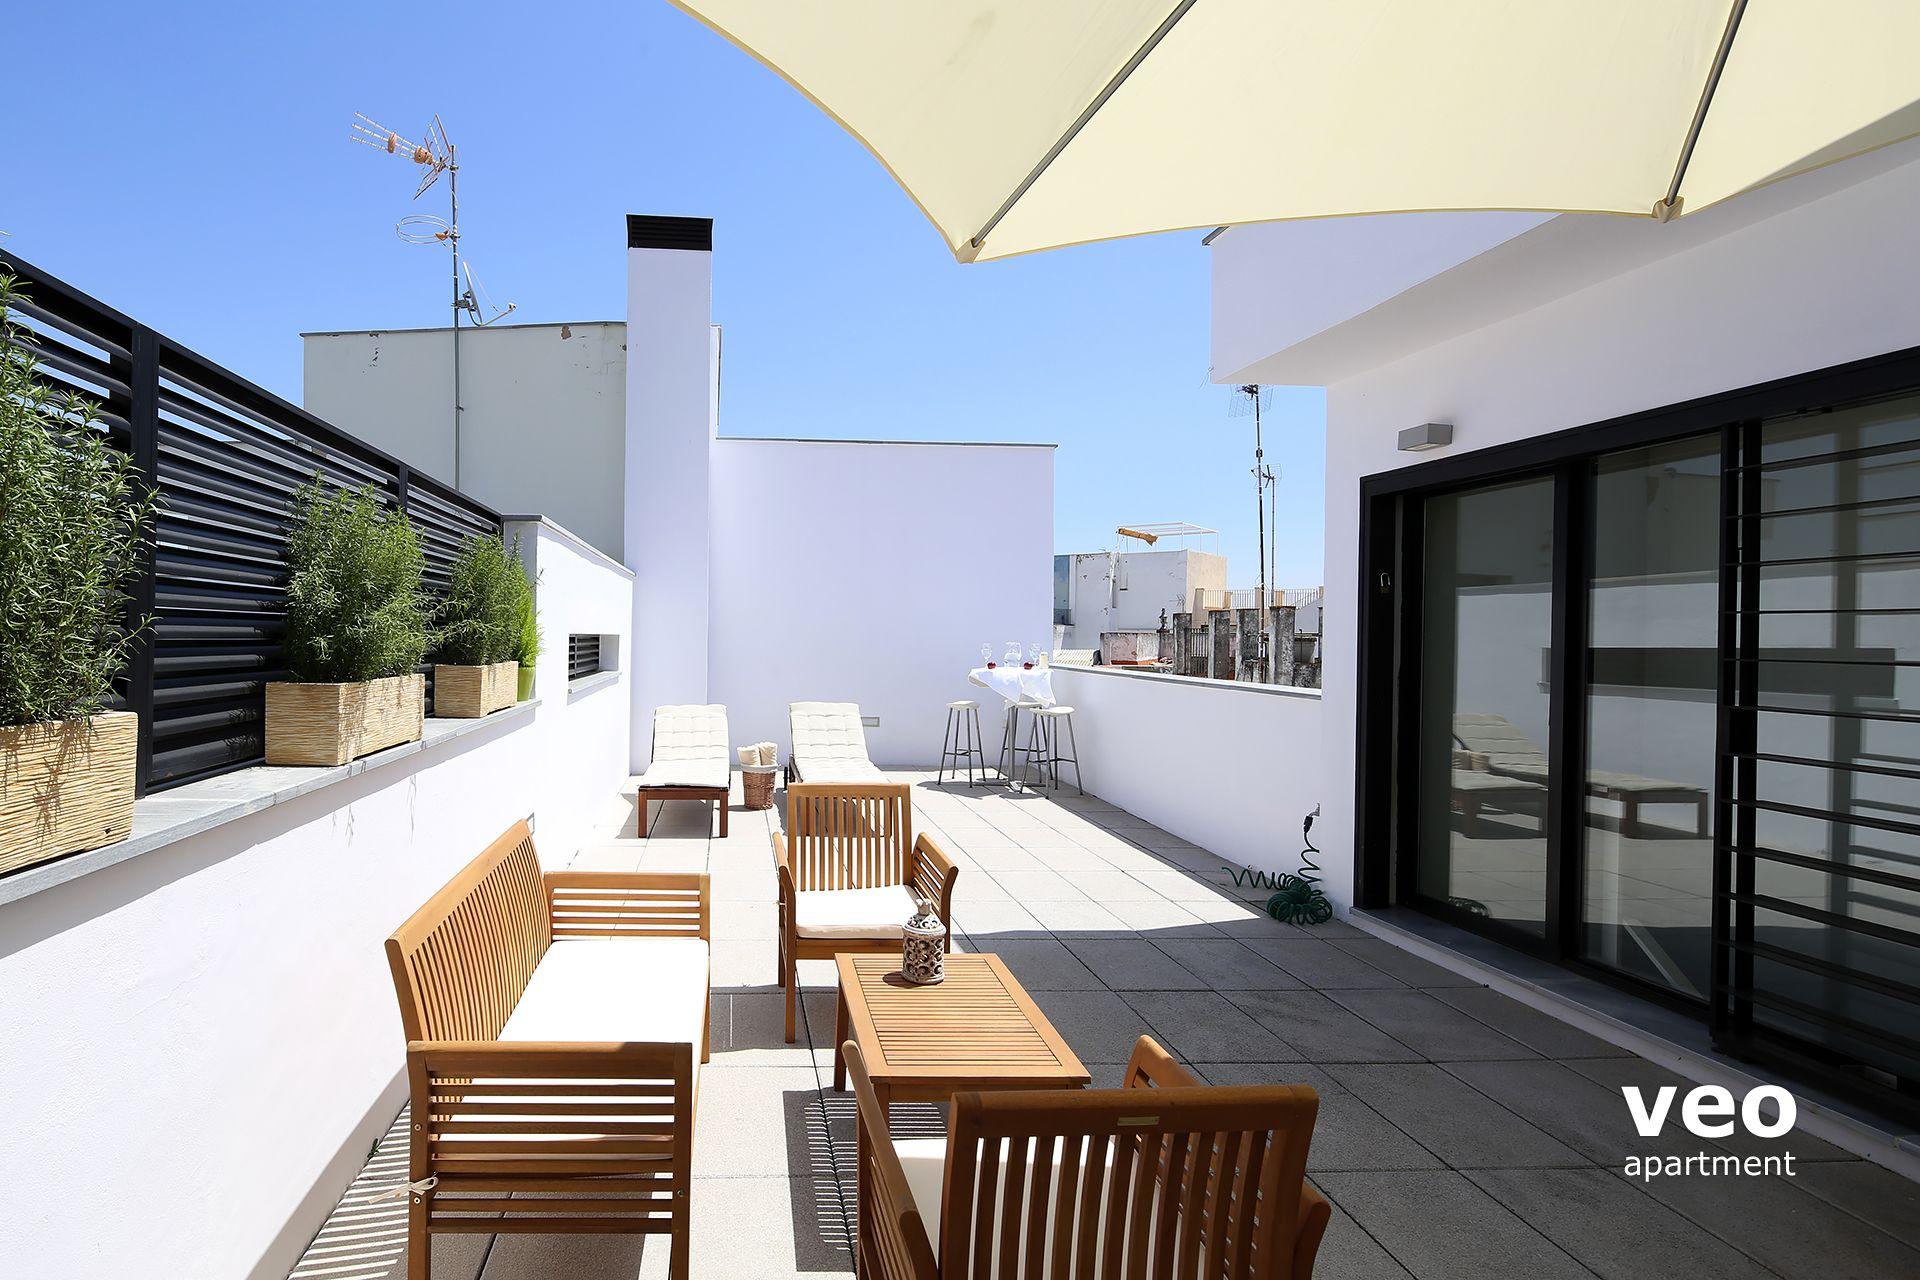 Seville apartment corral del rey street seville spain for Terrace seating